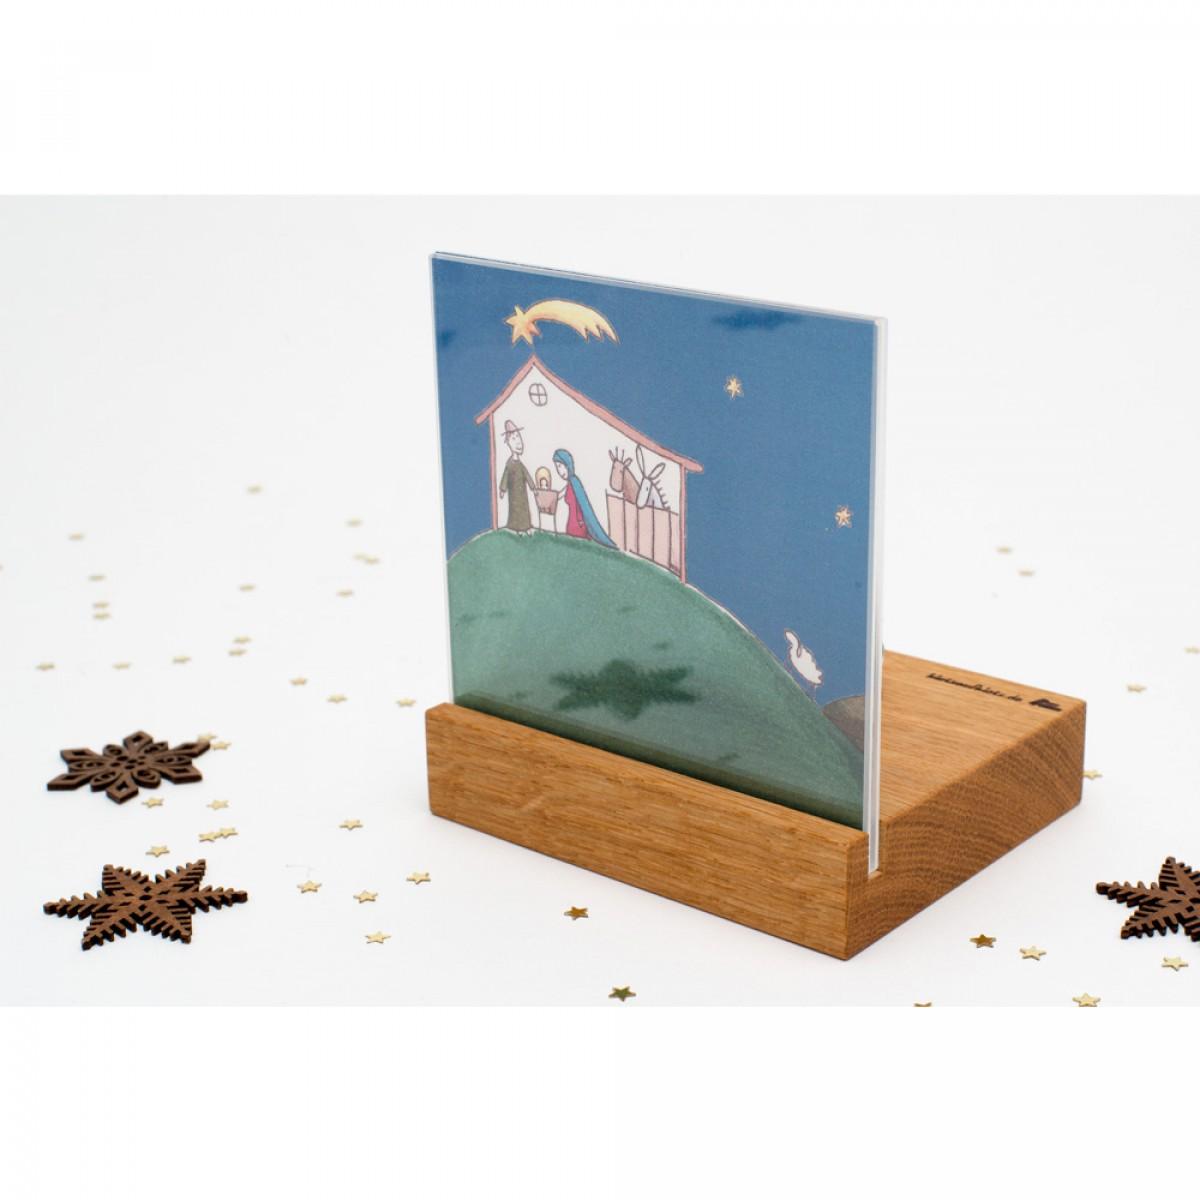 klotzaufklotz Weihnachtskrippe Mini Landschaft (Eichenholz)